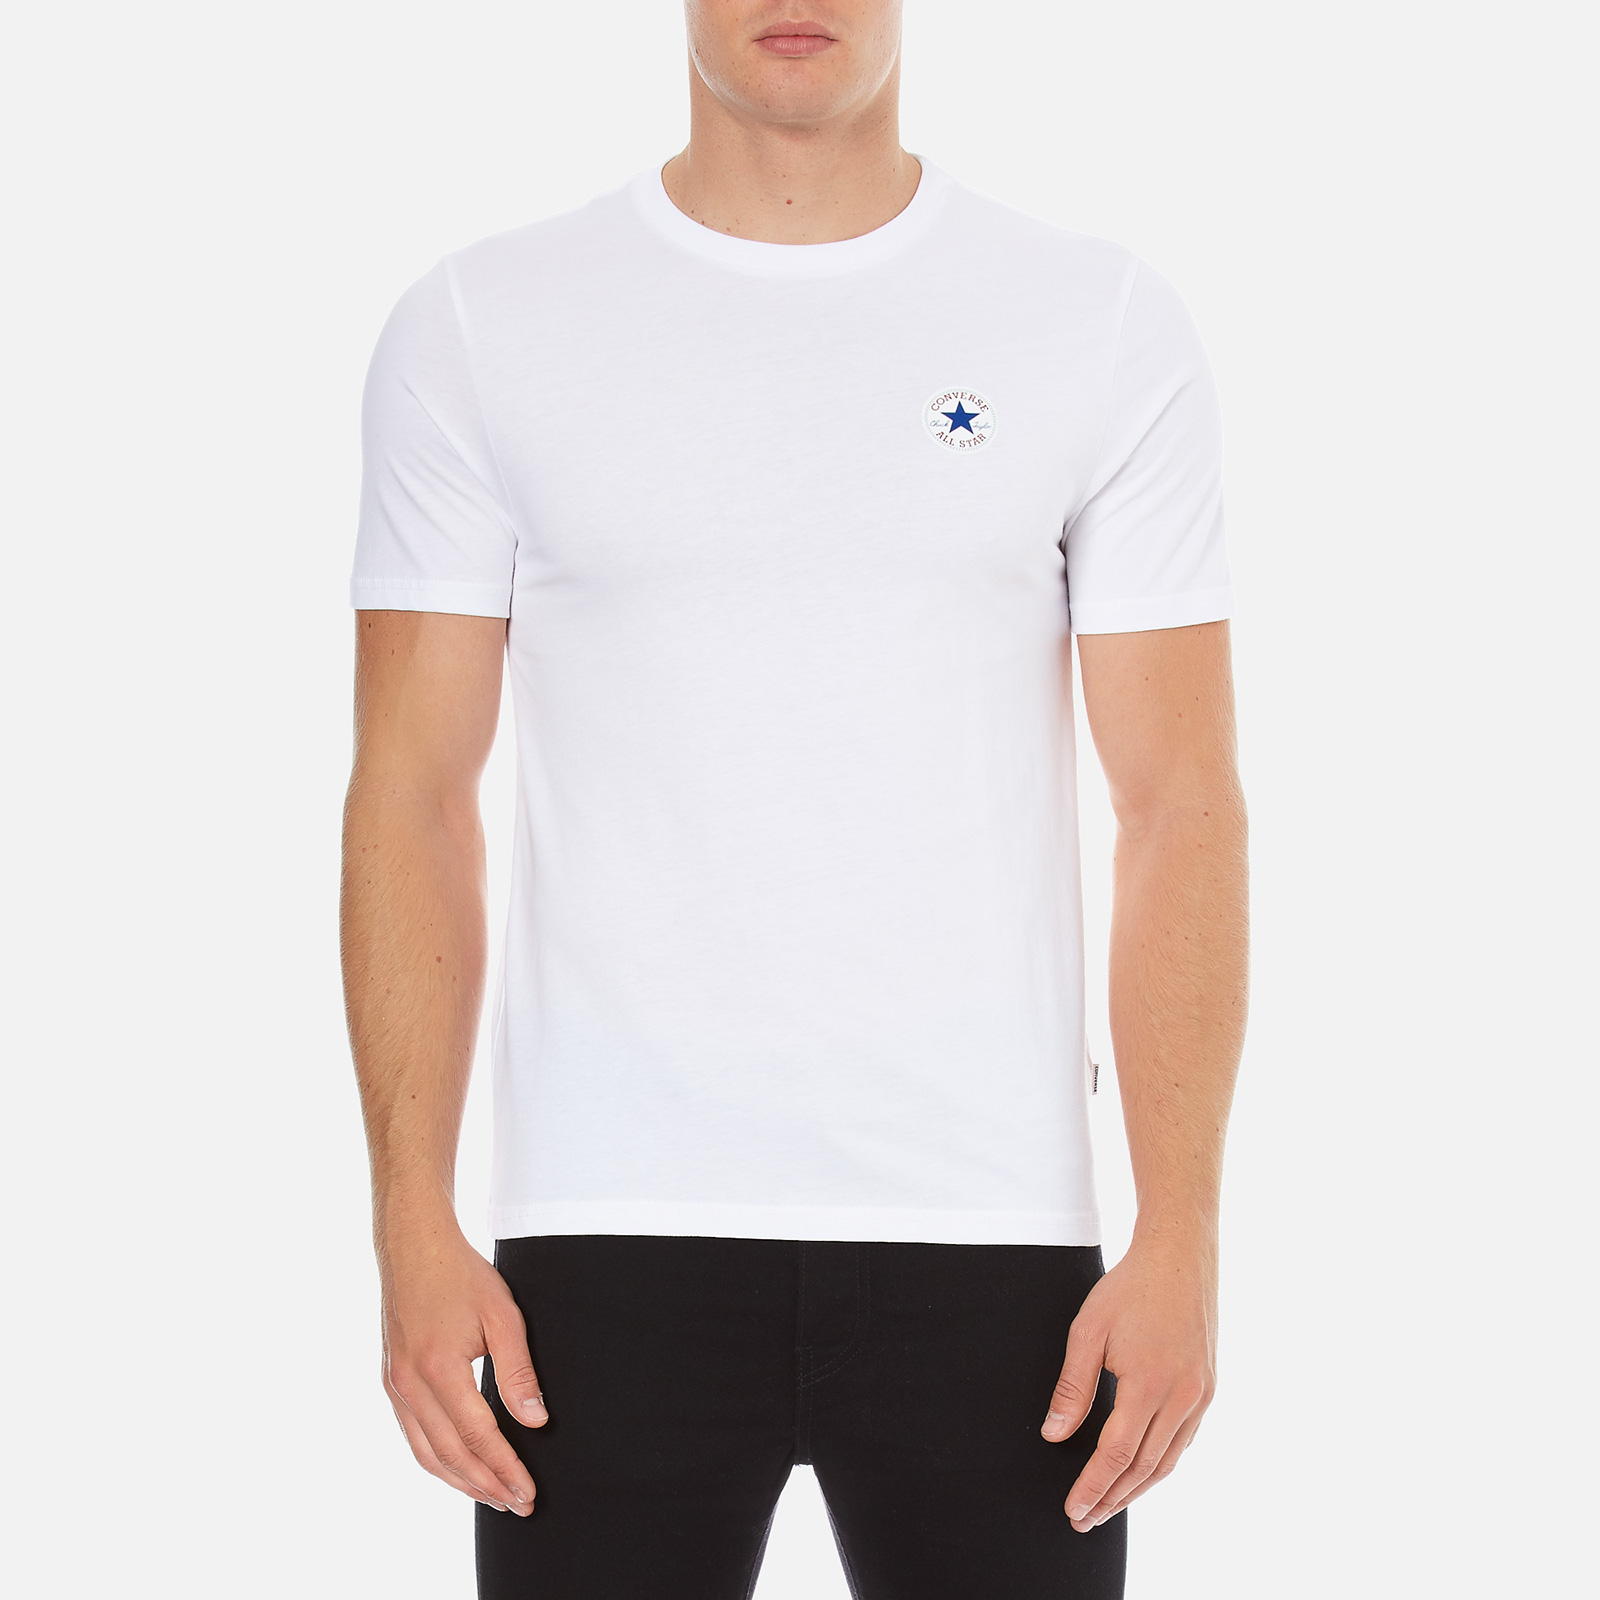 00c9e964bcf2 Converse Men s All Star Core Left Chest CP Crew T-Shirt - White Mens  Clothing